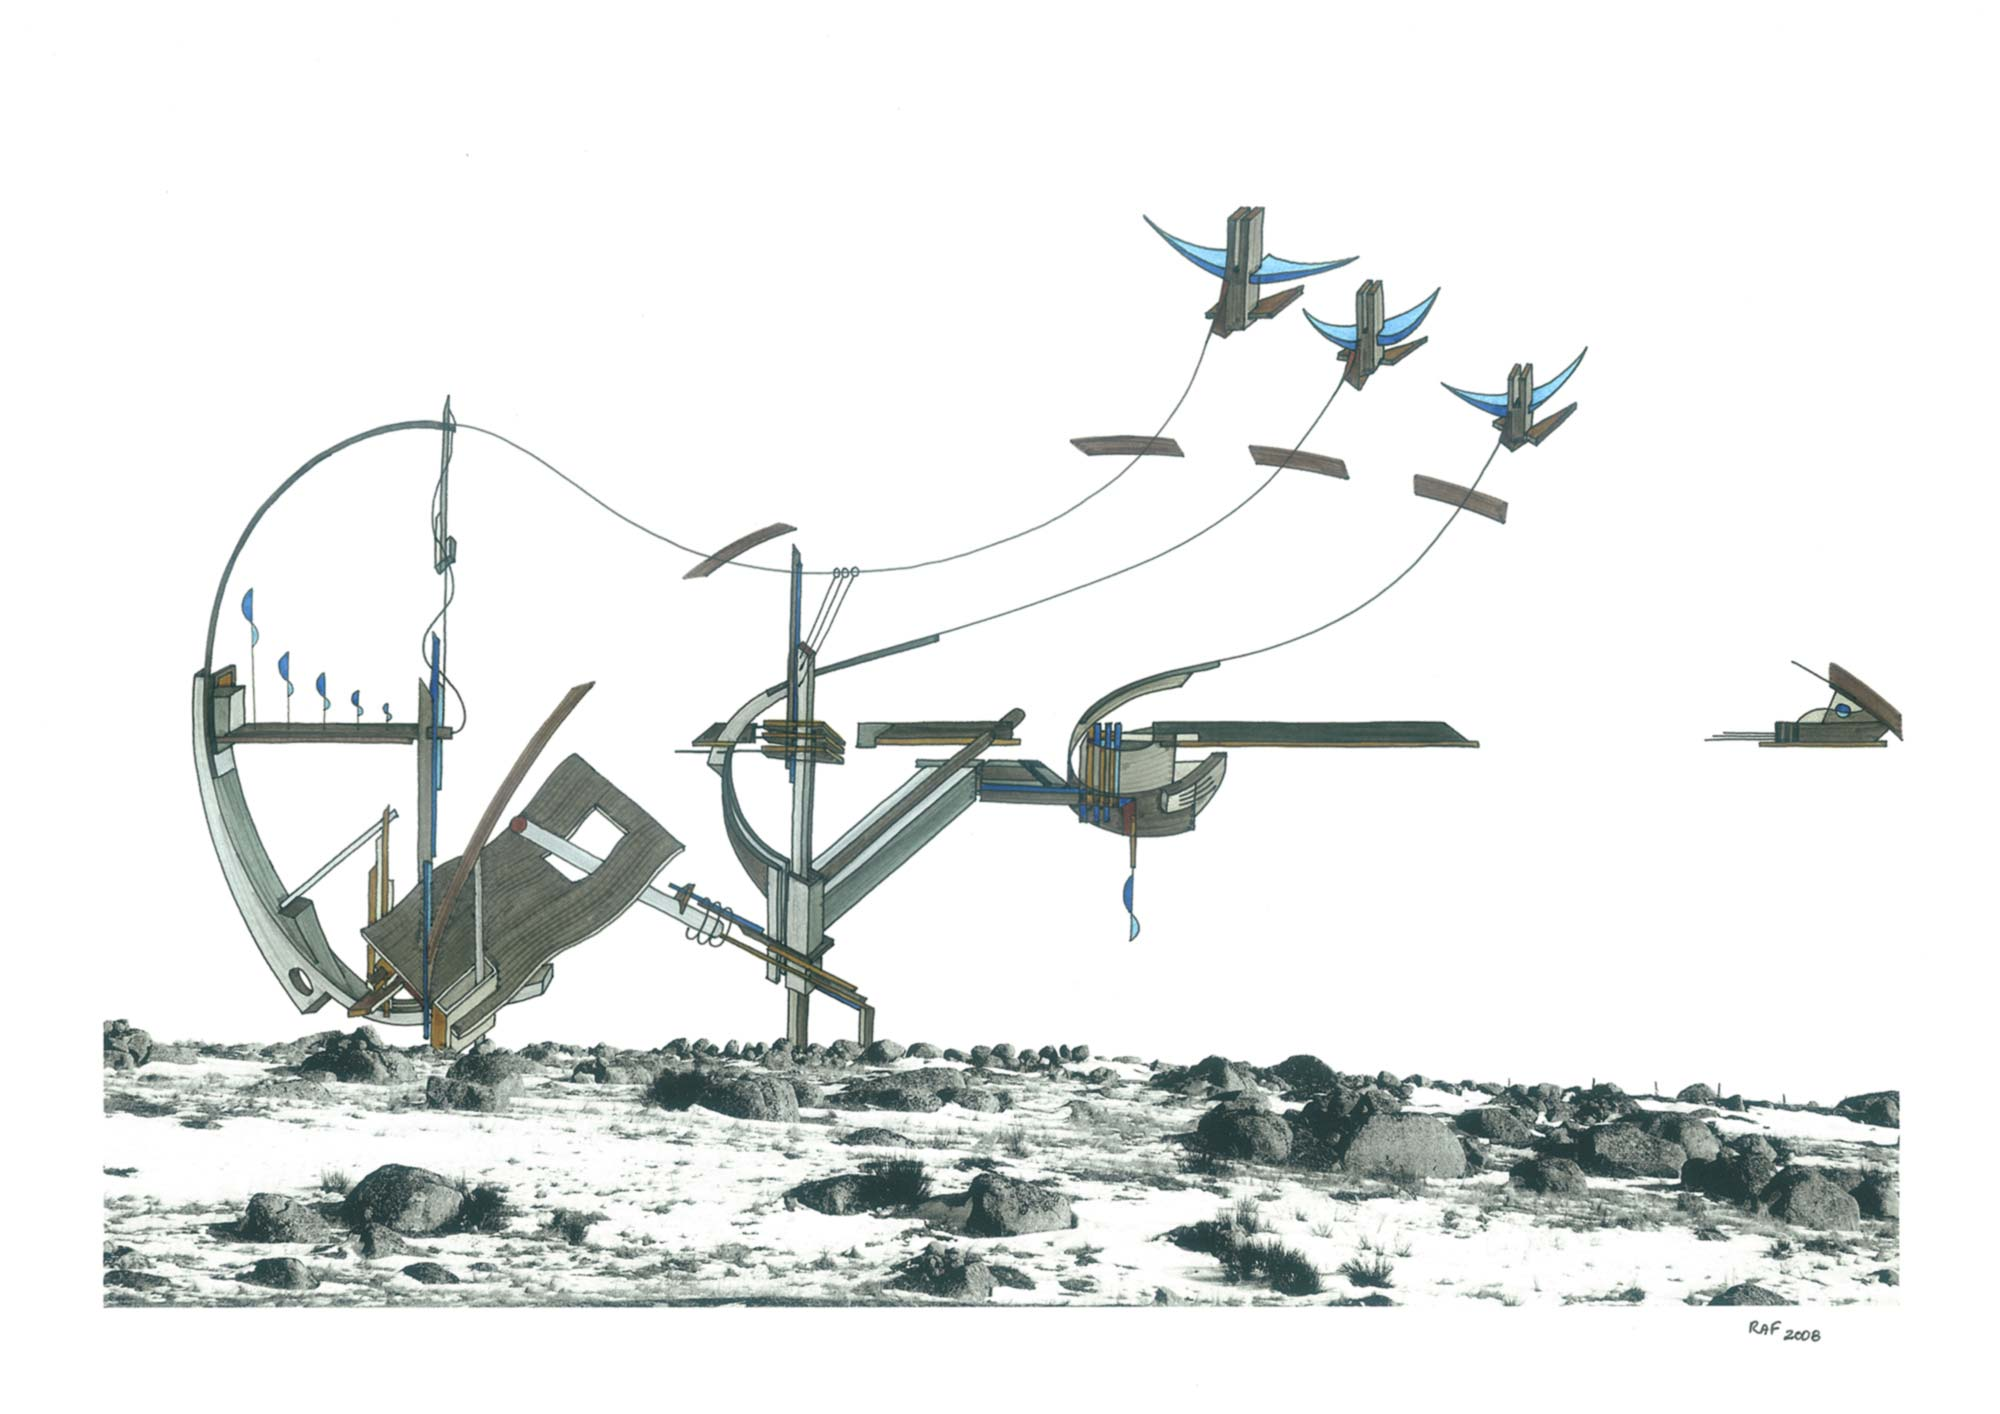 Aubrac, dessin, Raf Listowski, 2007